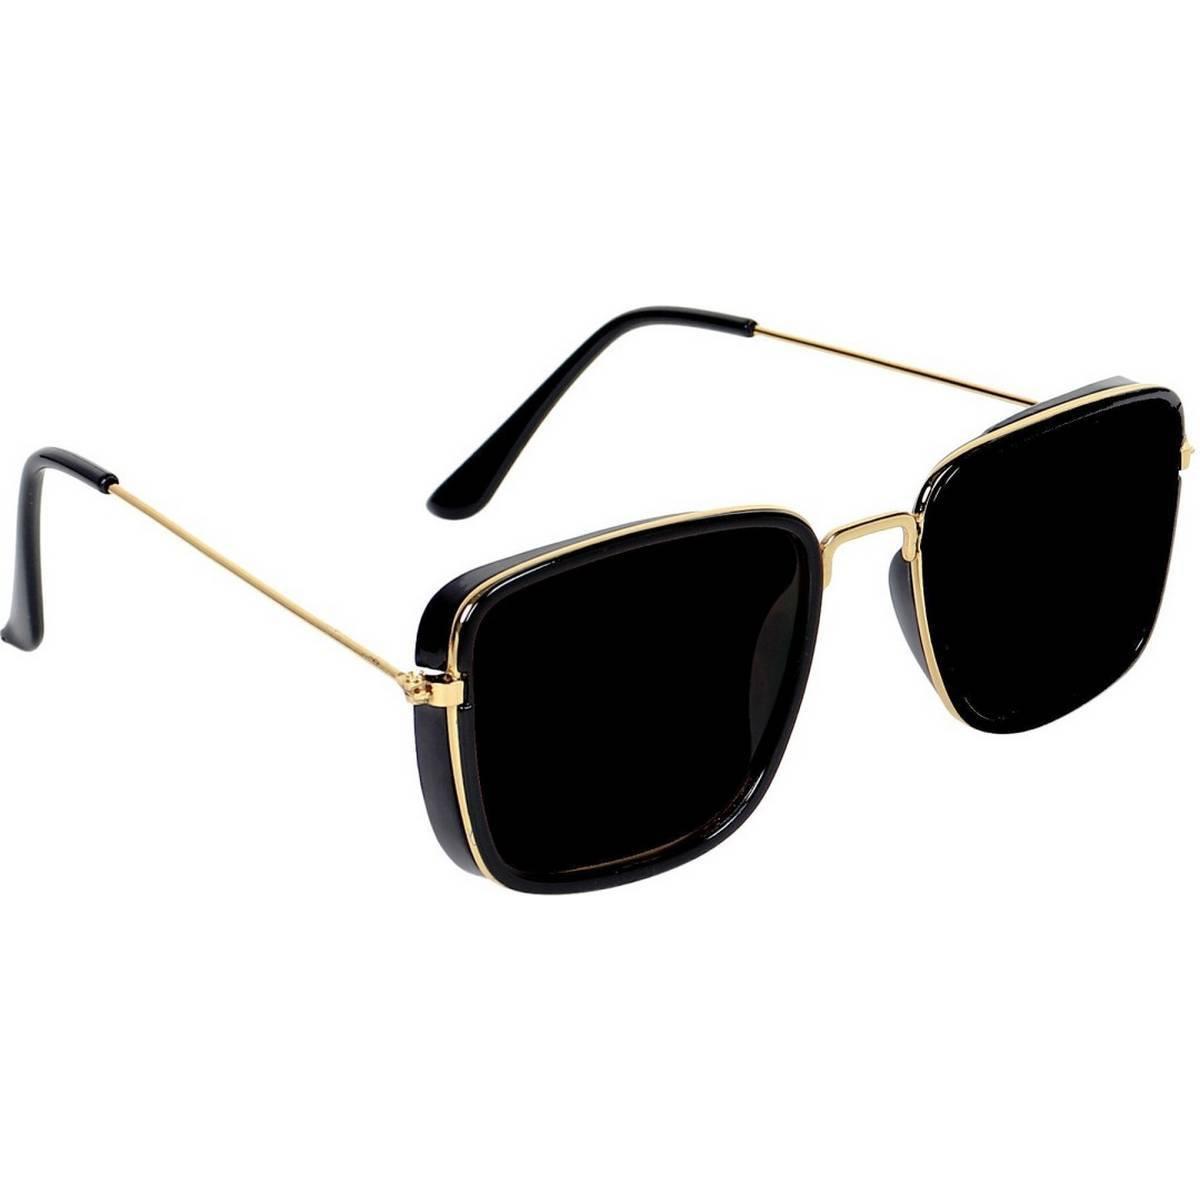 imported Sunglasses For Men Square Retro Cool Sun Shades Steampunk Style Frame Sun Glasses for Men